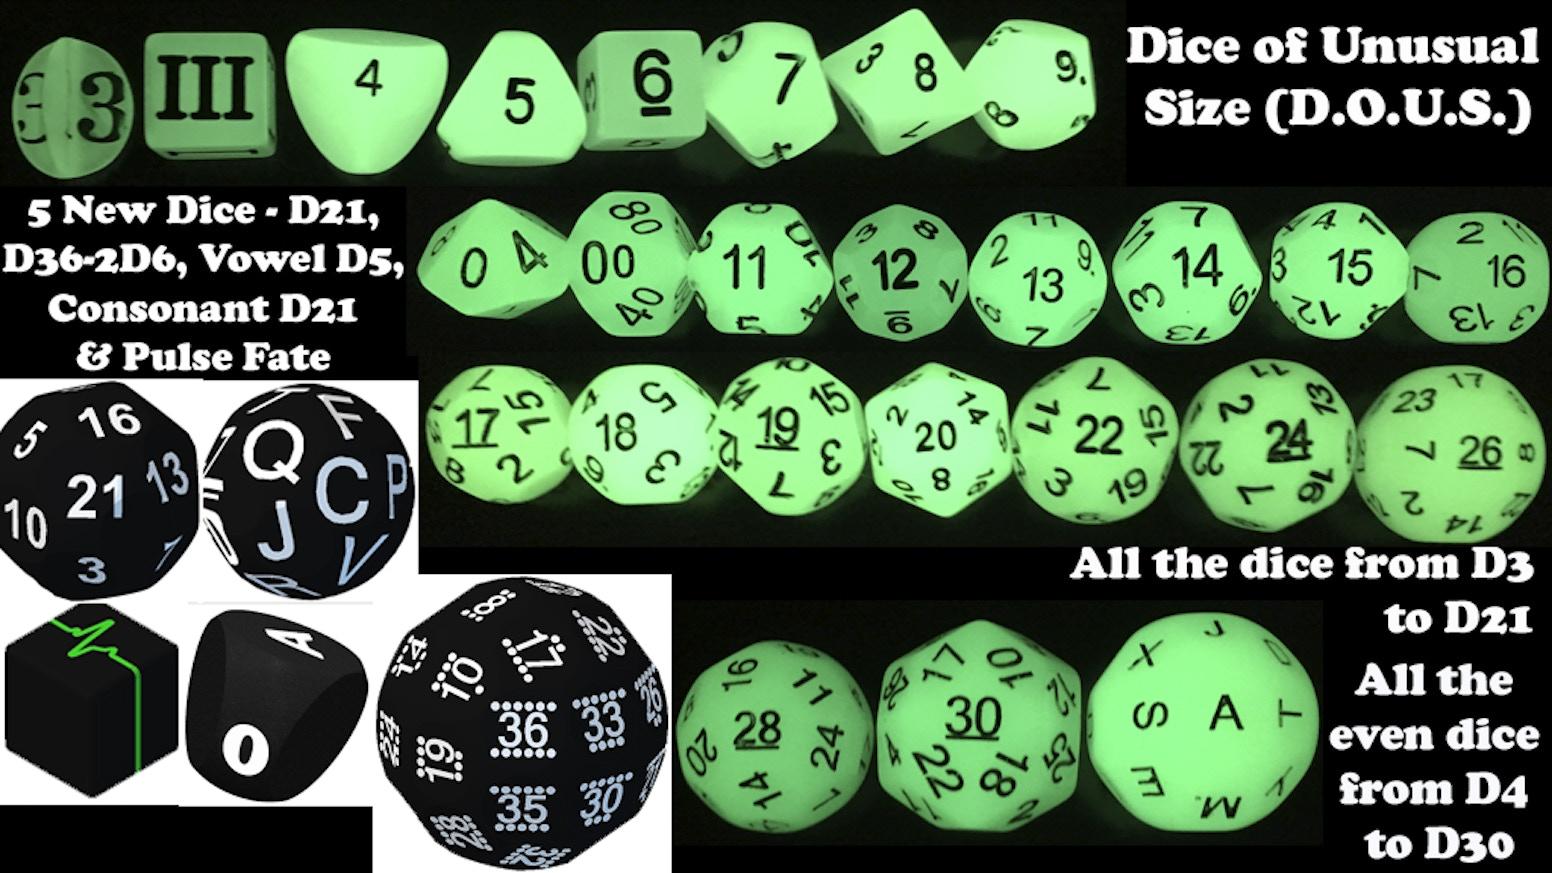 New unusual dice.  A D21, D36, Pulse Fudge Die, Vowel D5 and Consonant D21